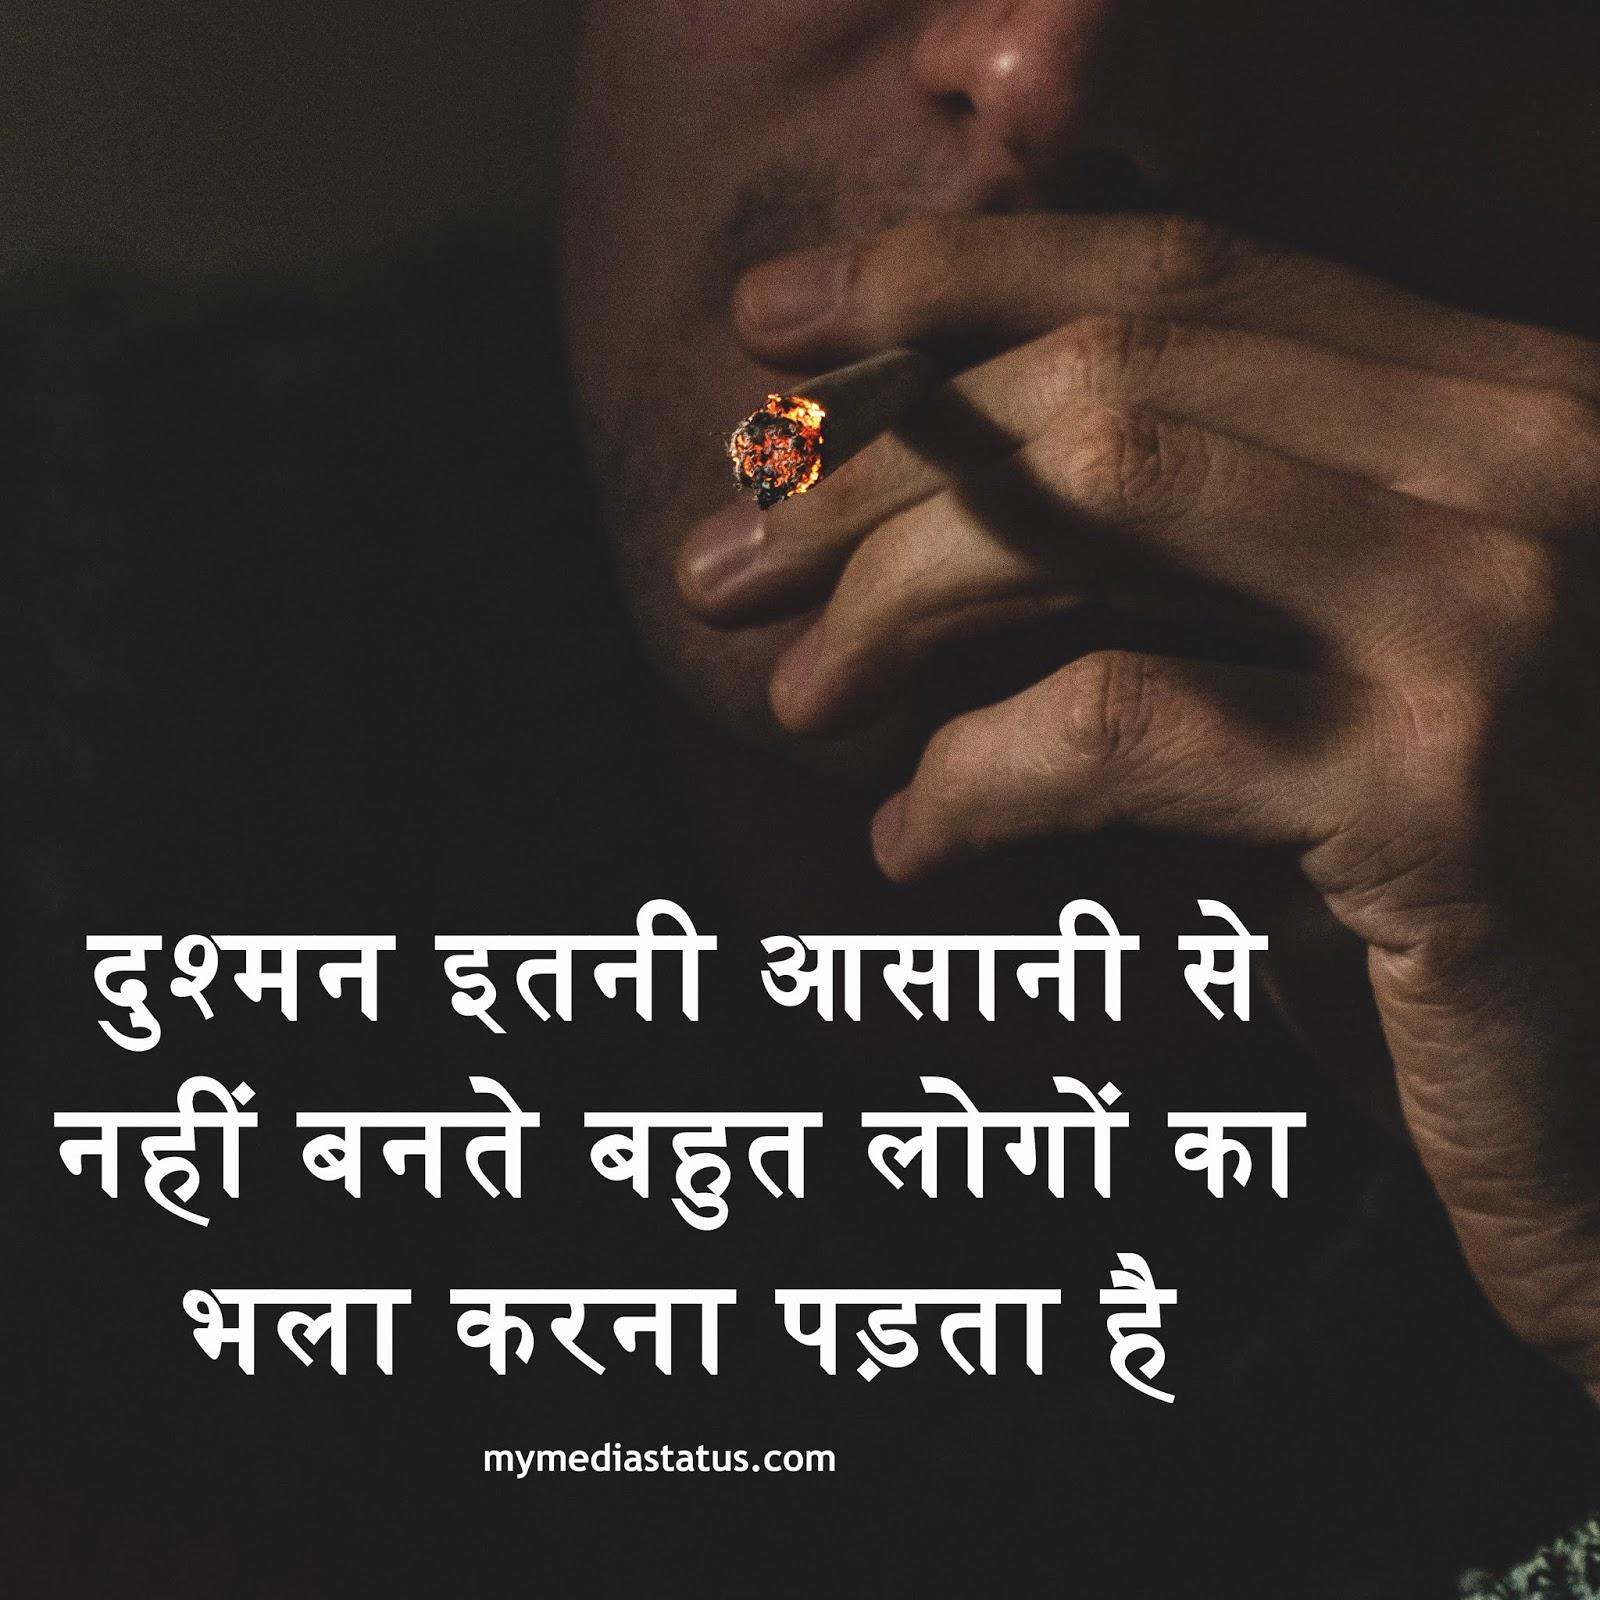 Top Best ☋ Attitude ☋ Status in Hindi for WhatsApp